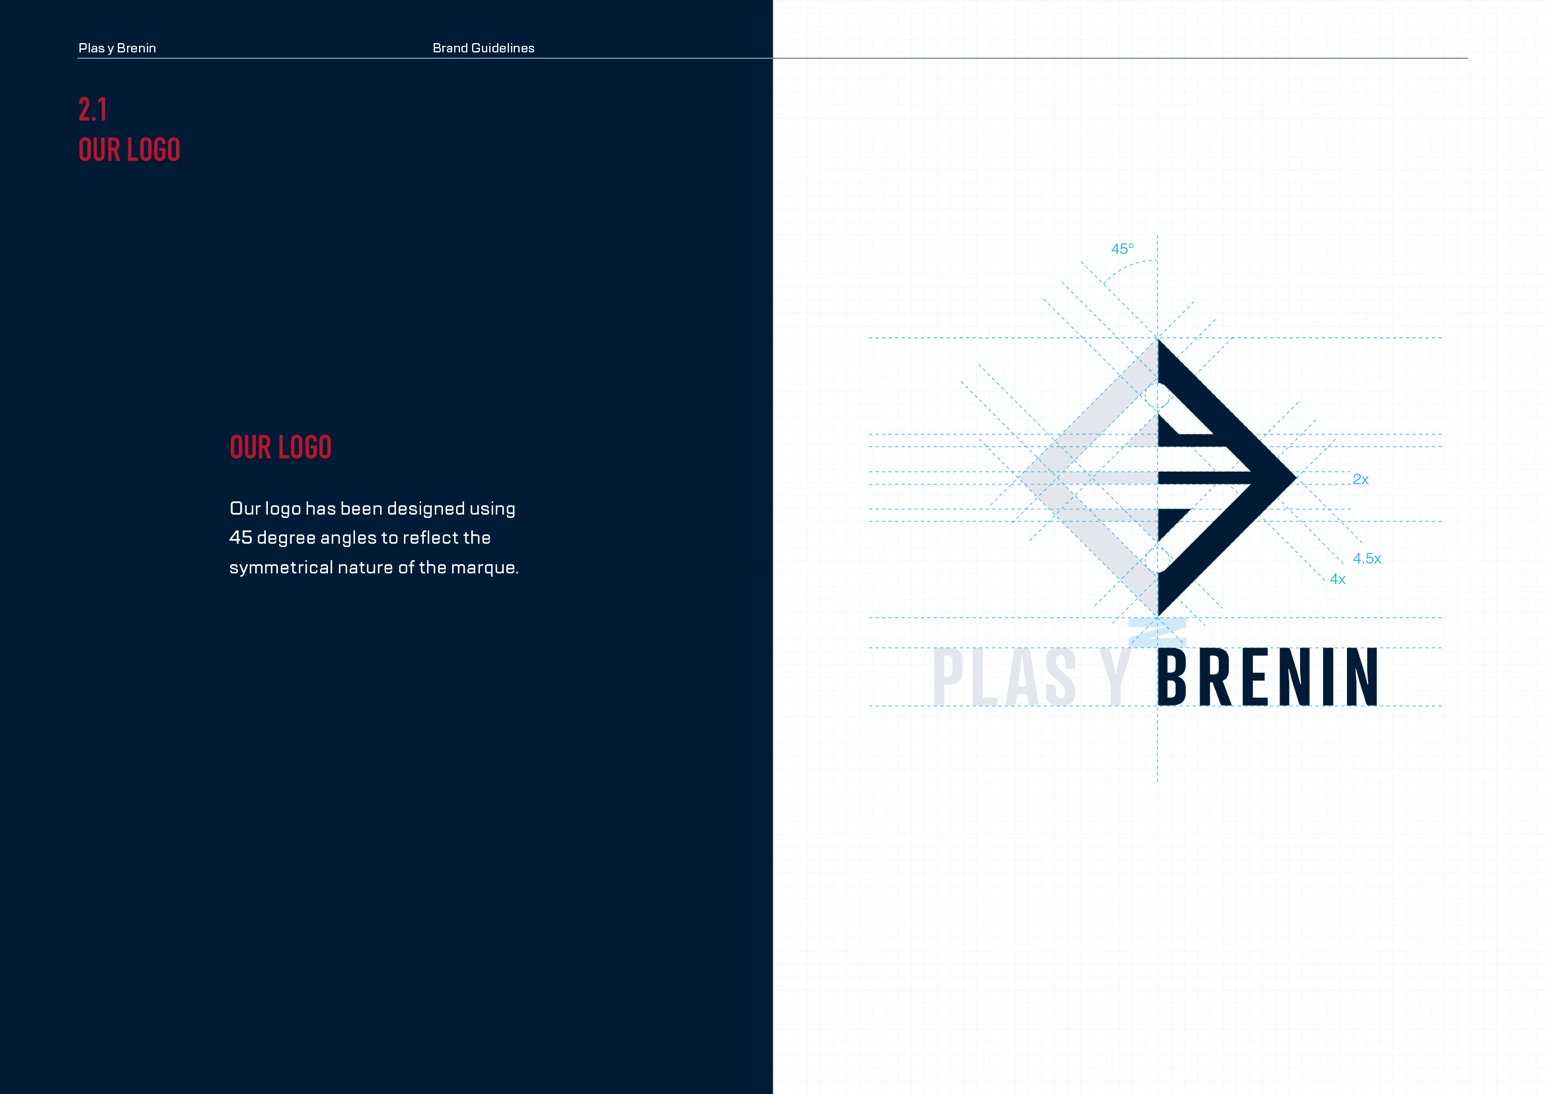 Plas Y Brenin (PYB) Brand Guidelines - The Logo